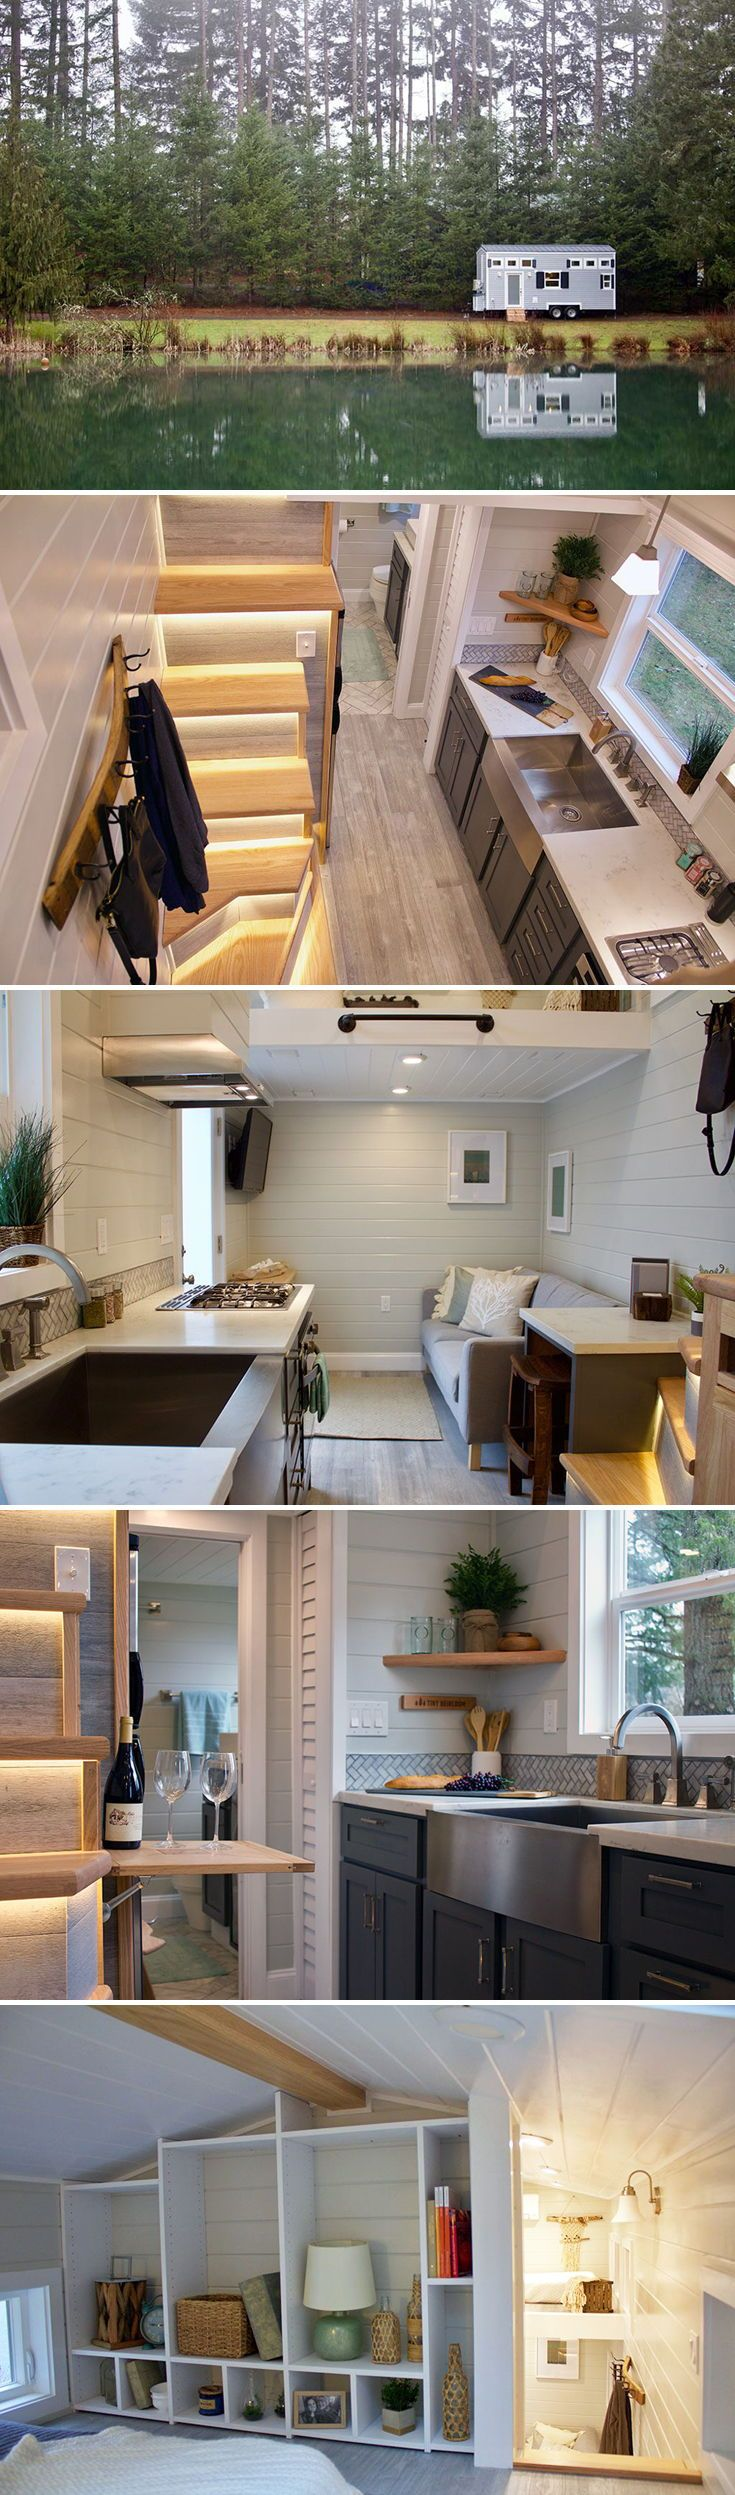 Tiny Replica Home by Tiny Heirloom - Tiny Living